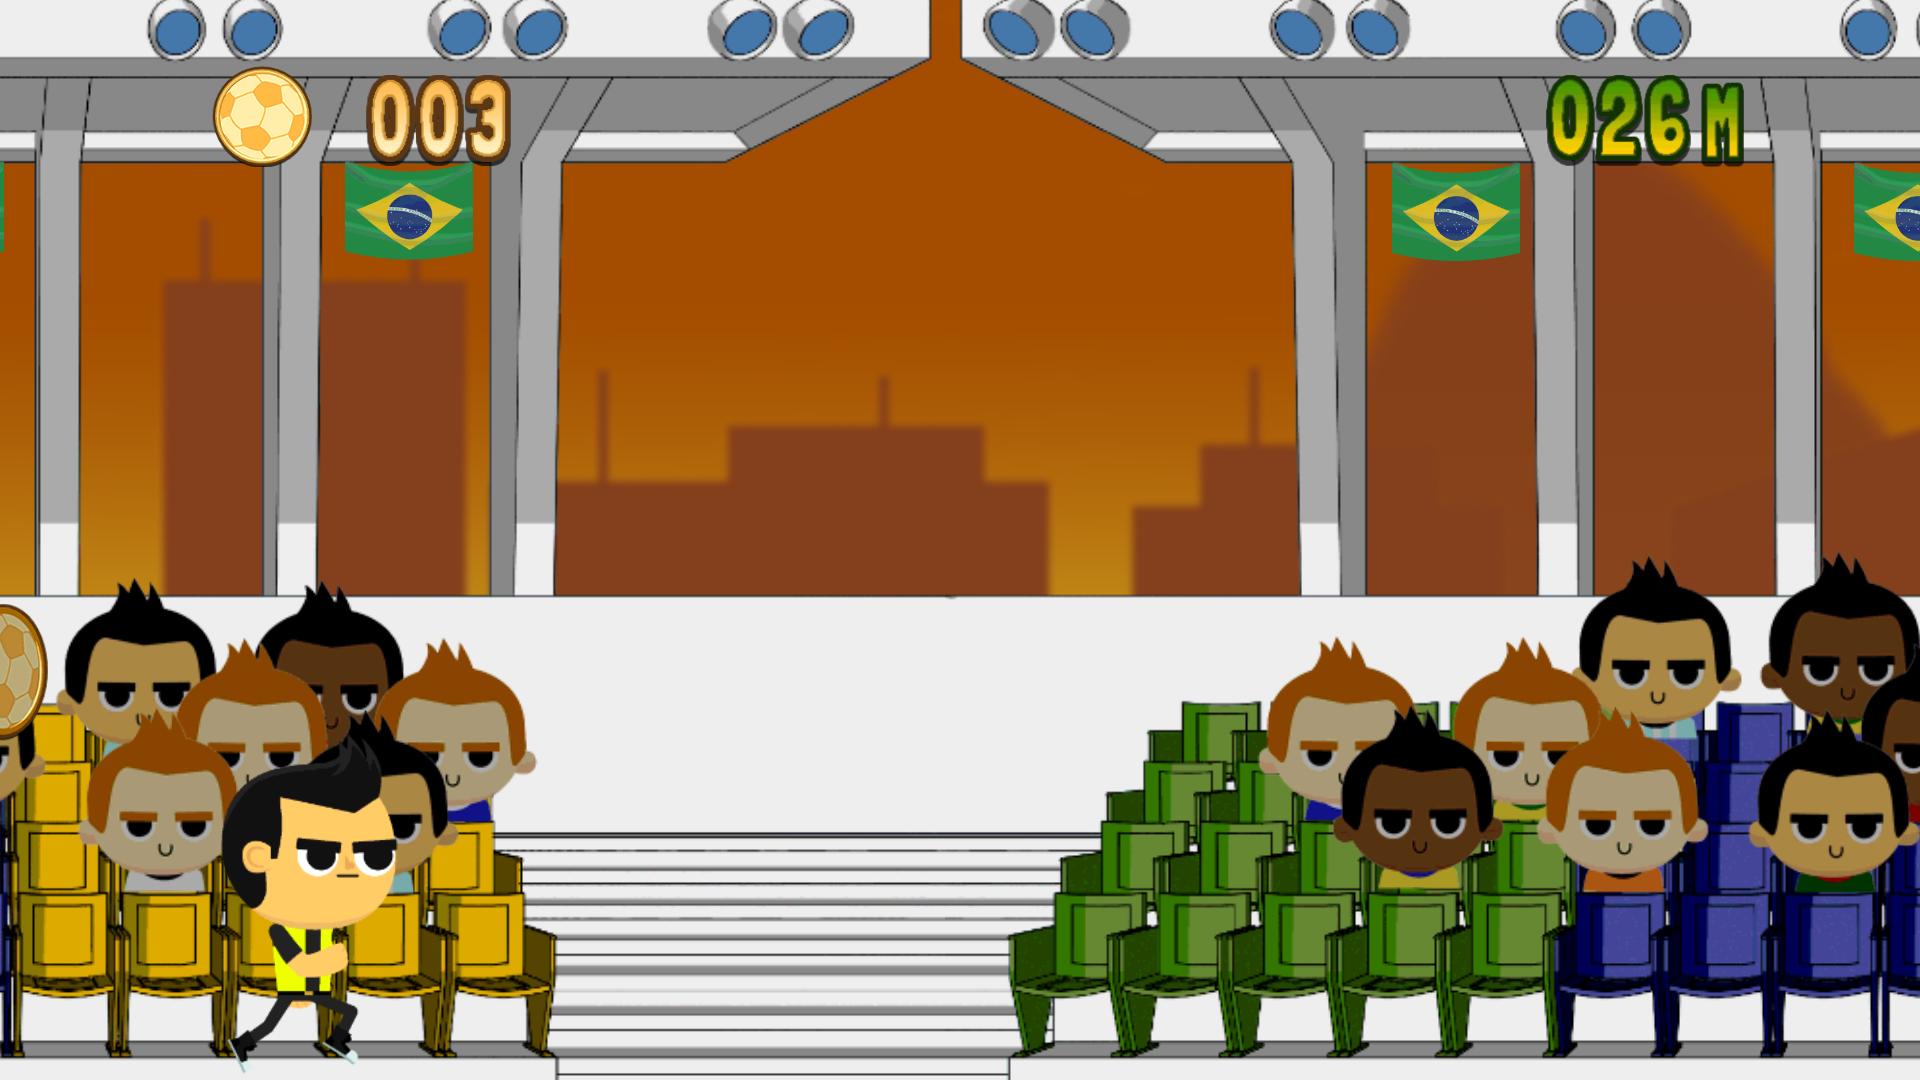 Run Cop Run Brazil Edition!